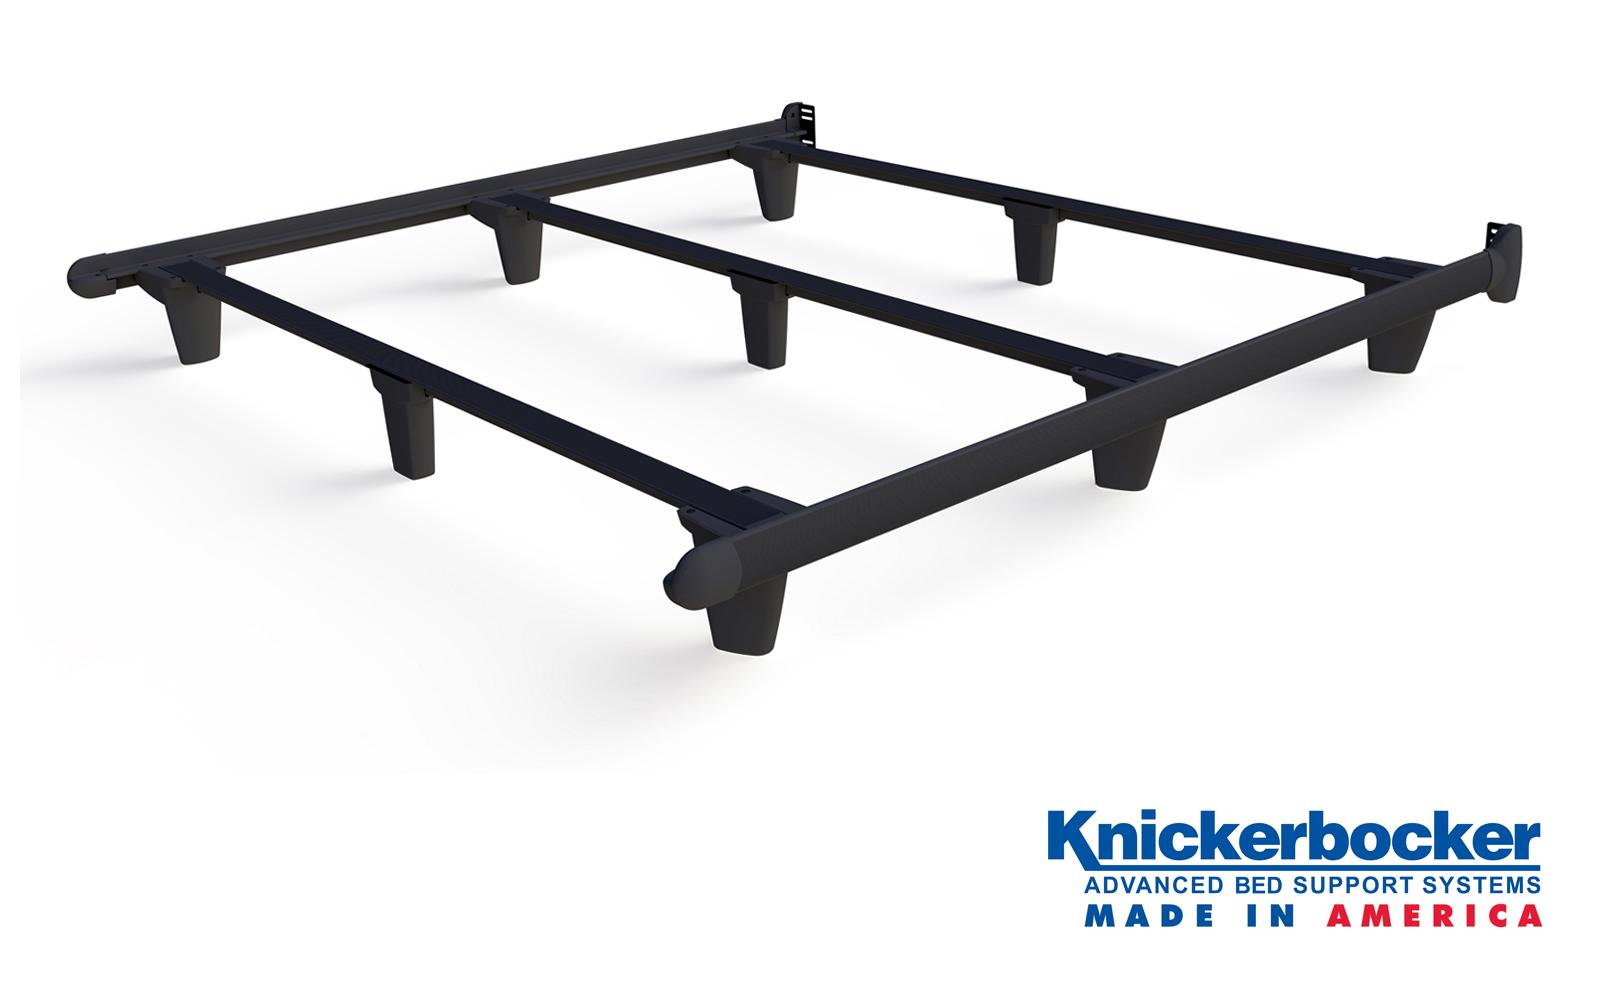 King Embrace Bed Frame Knickerbocker Bed Frame Company